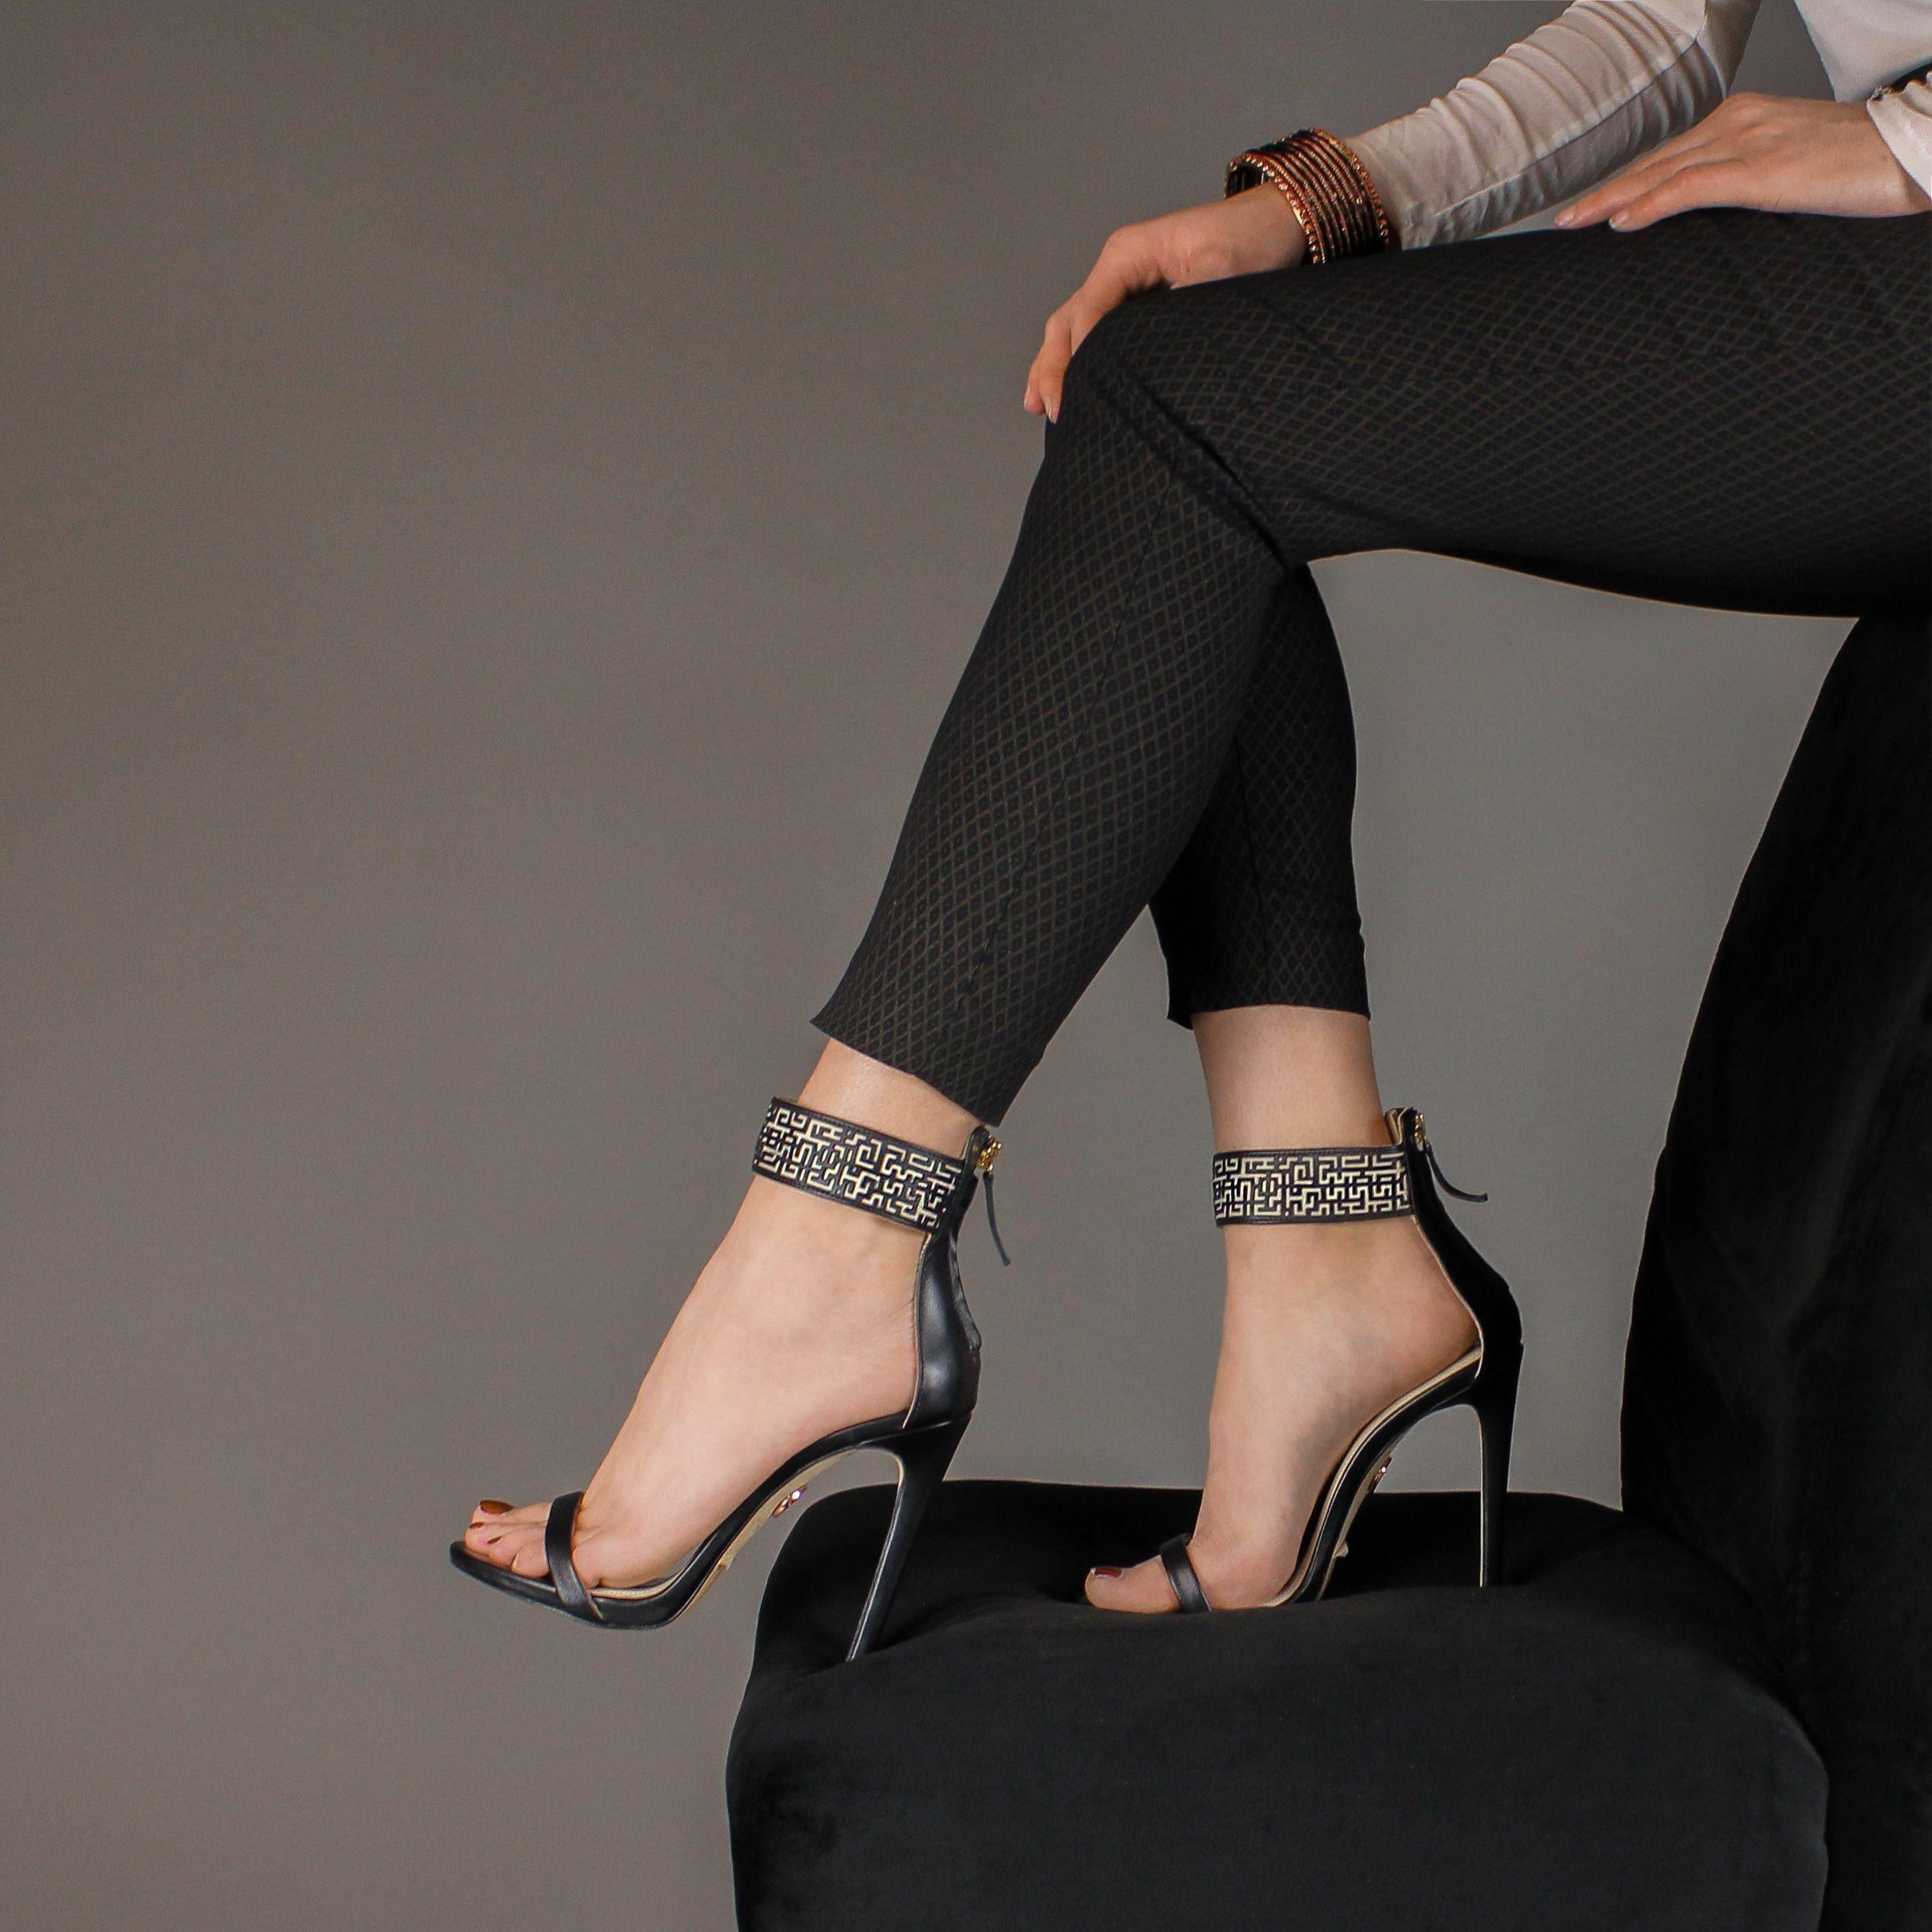 Xeneta Stiletto Sandals - Haany Bano